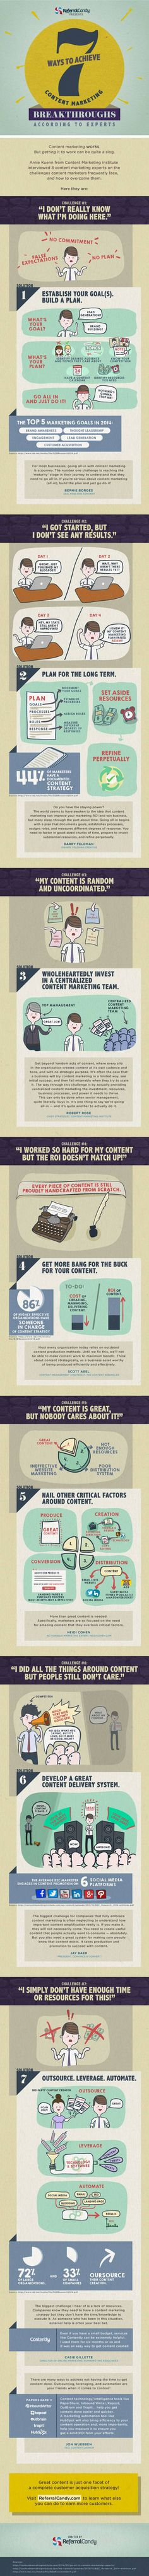 7 Ways To Achieve Content Marketing Breakthroughs #infographic #ContentMarketing #marketing